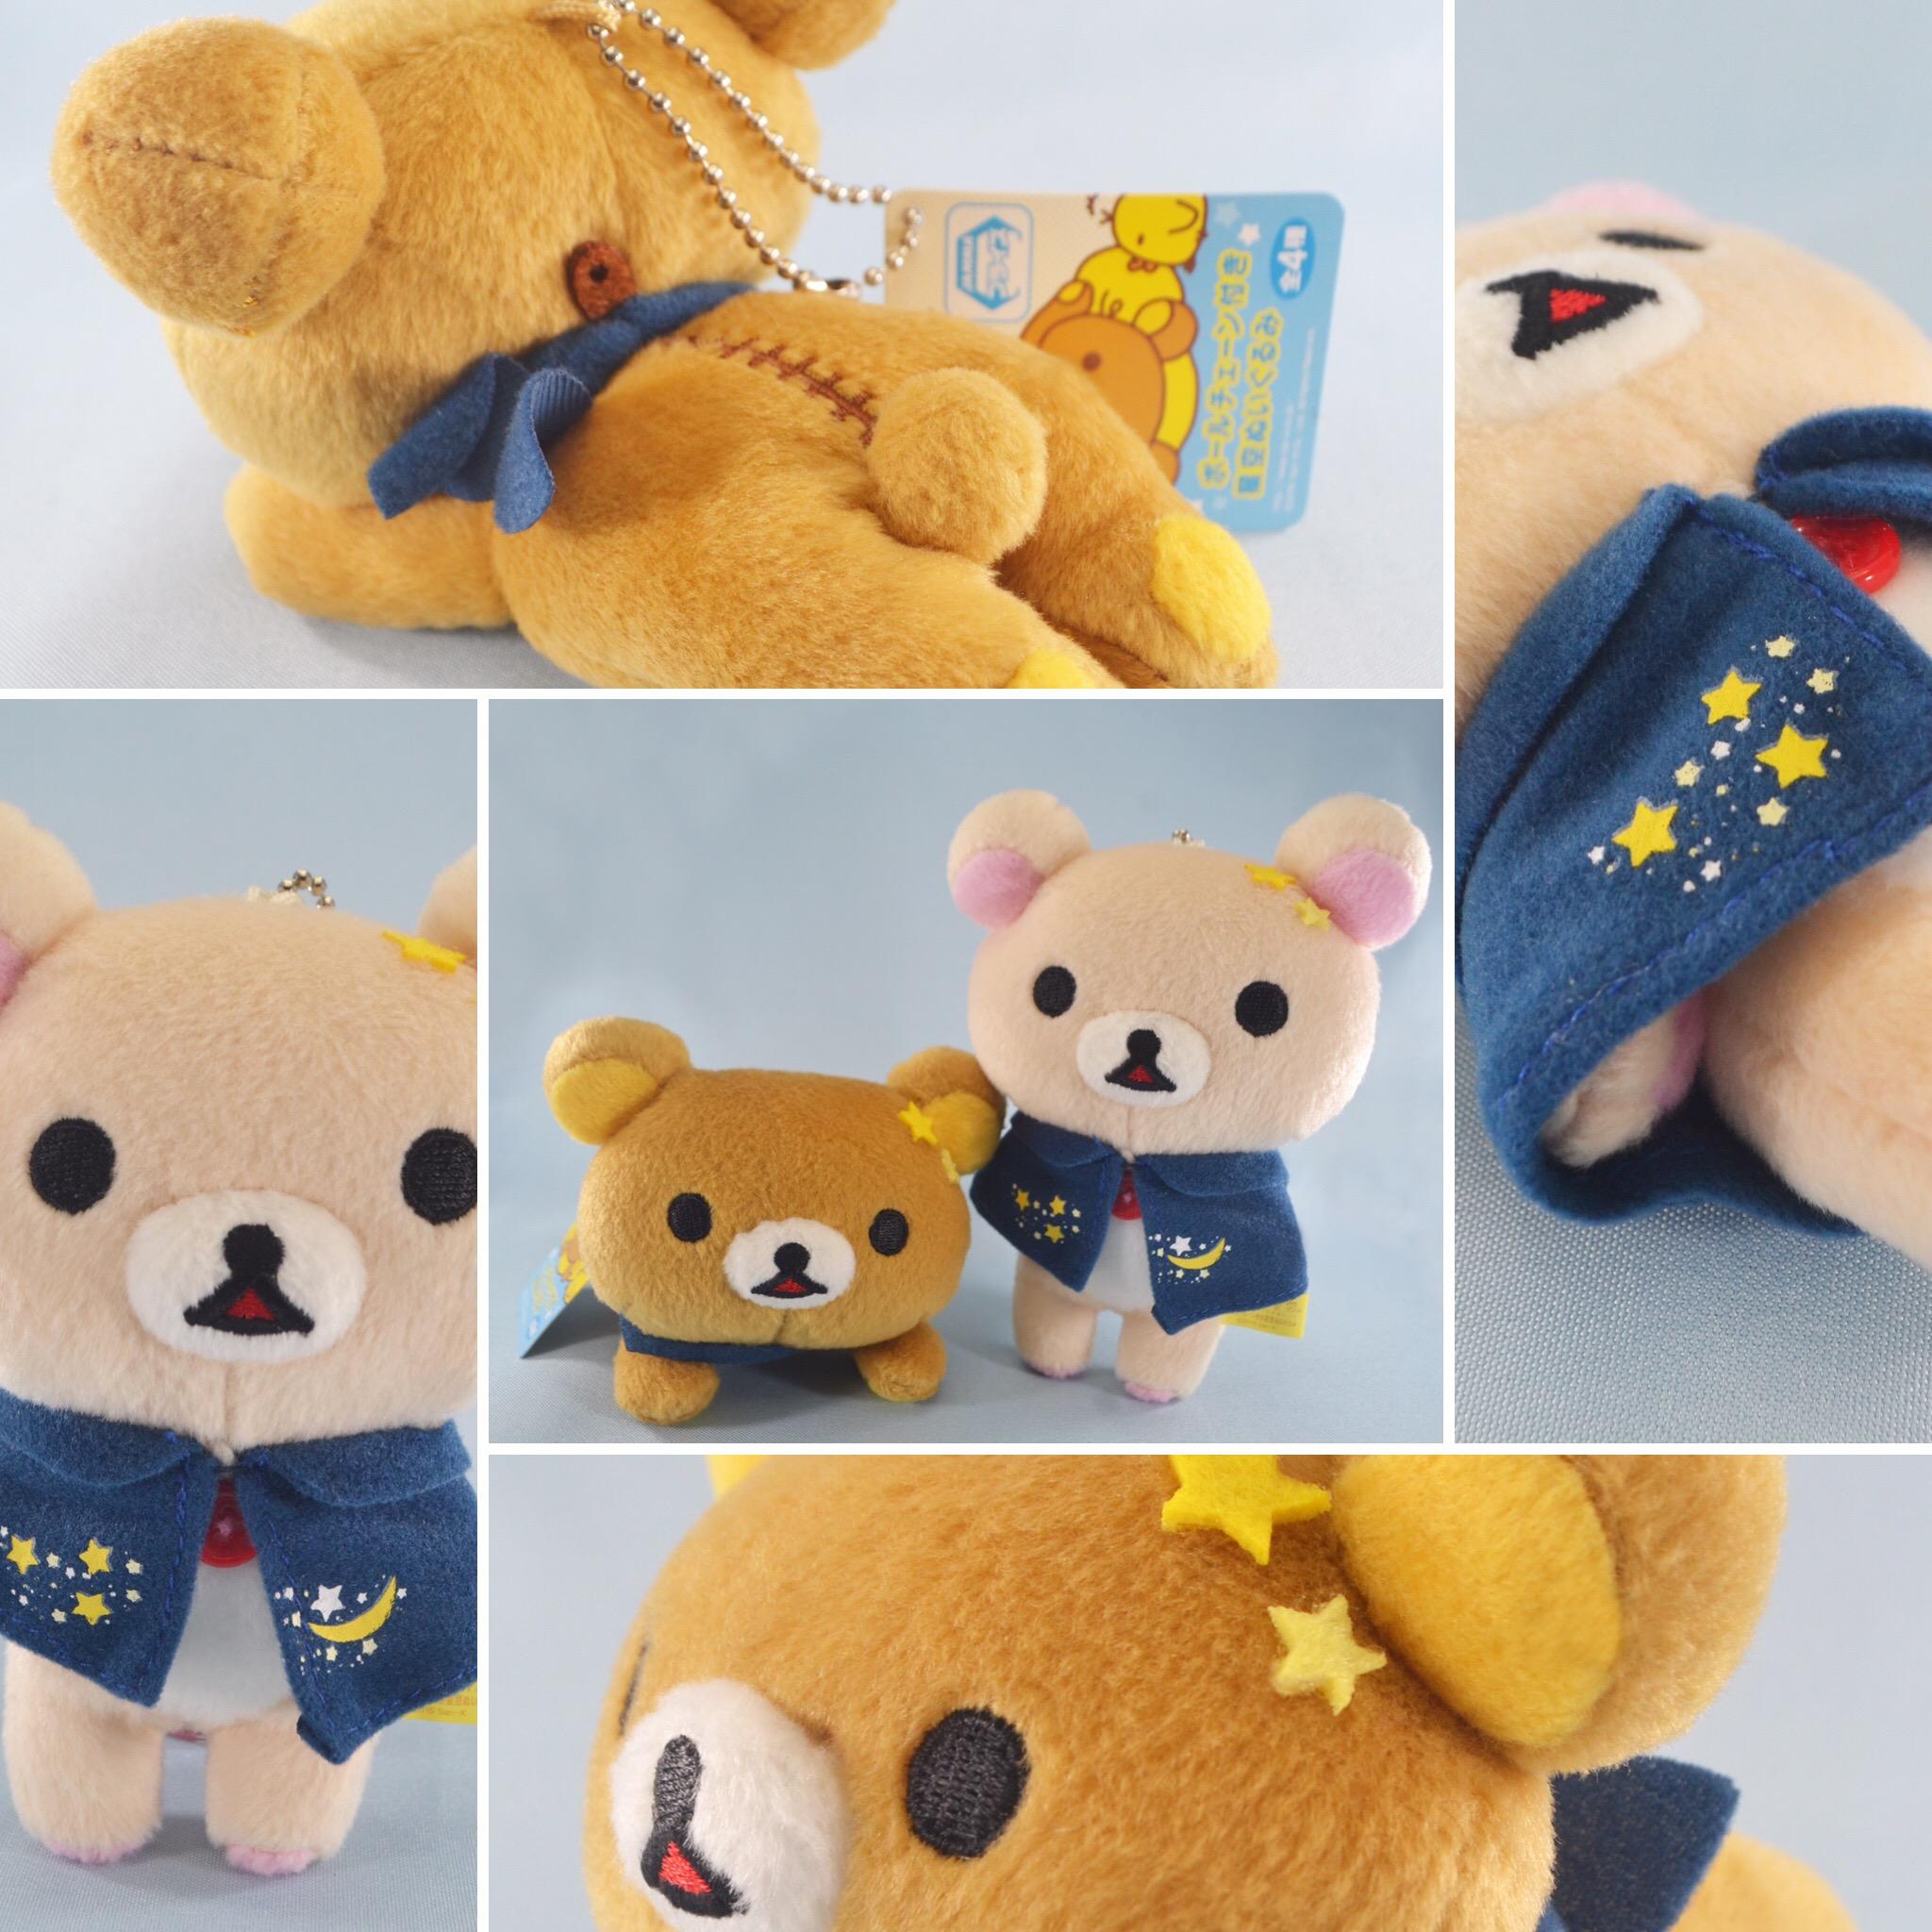 Korilakkuma Rilakkuma Plush kawaii plushie arcade starry night sky ufo catcher ufo crane game machine prize toreba sanx san-x import imported japan japanese stuff stuffed toy